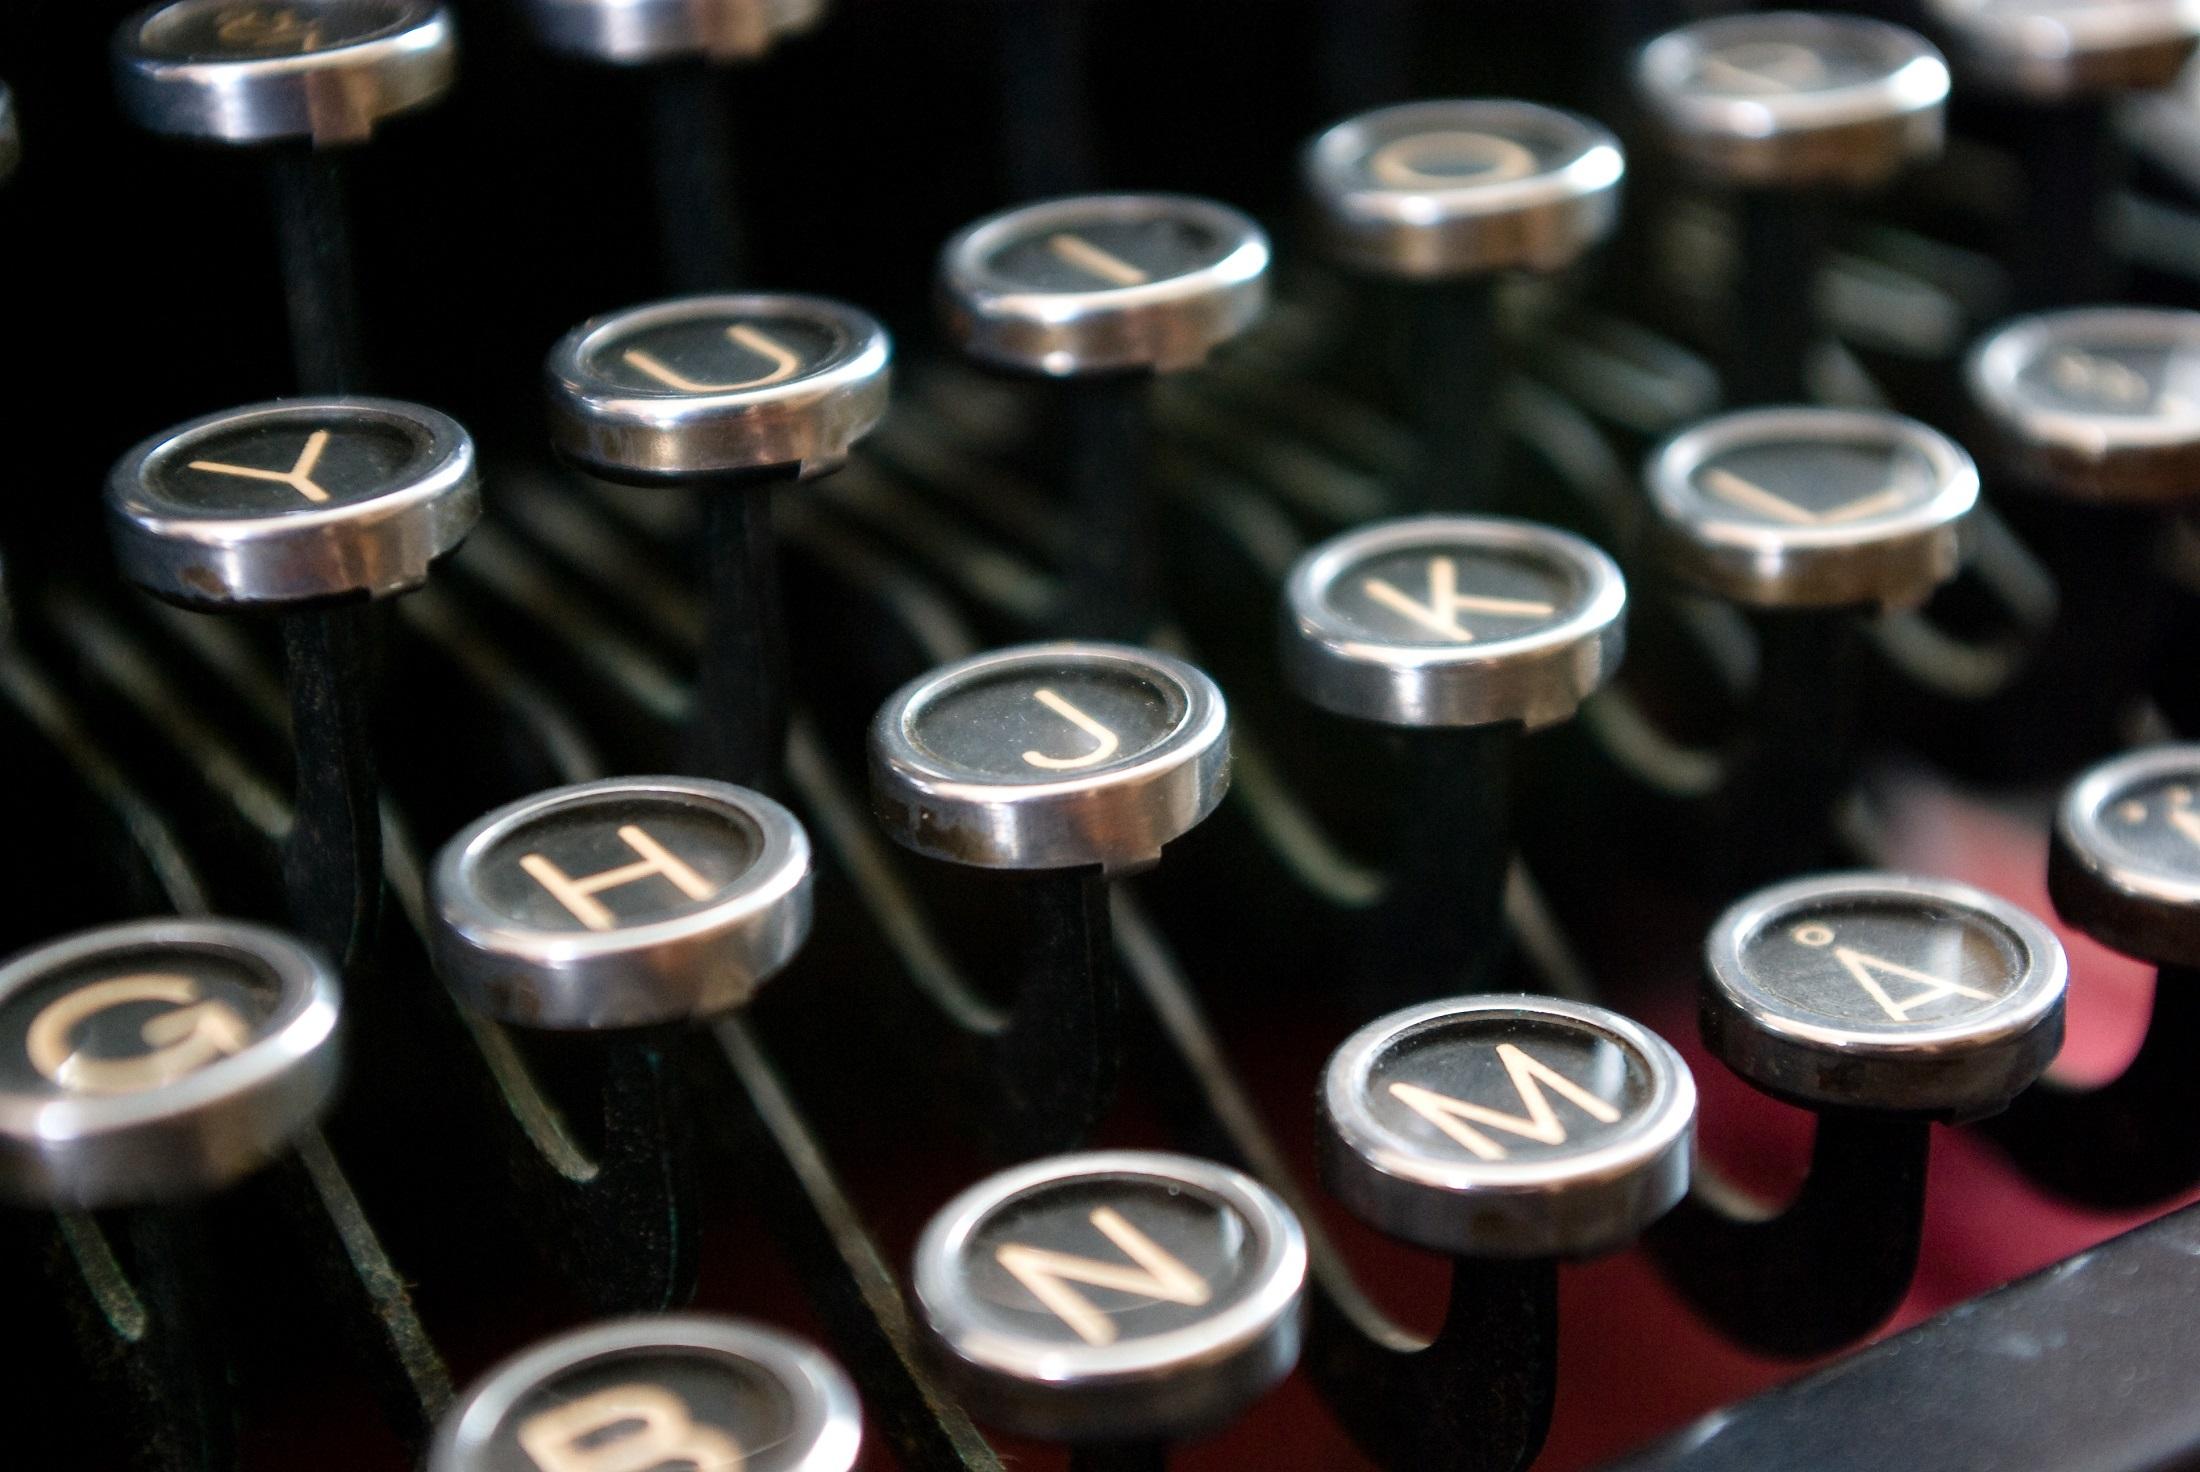 Typewriter keys photo